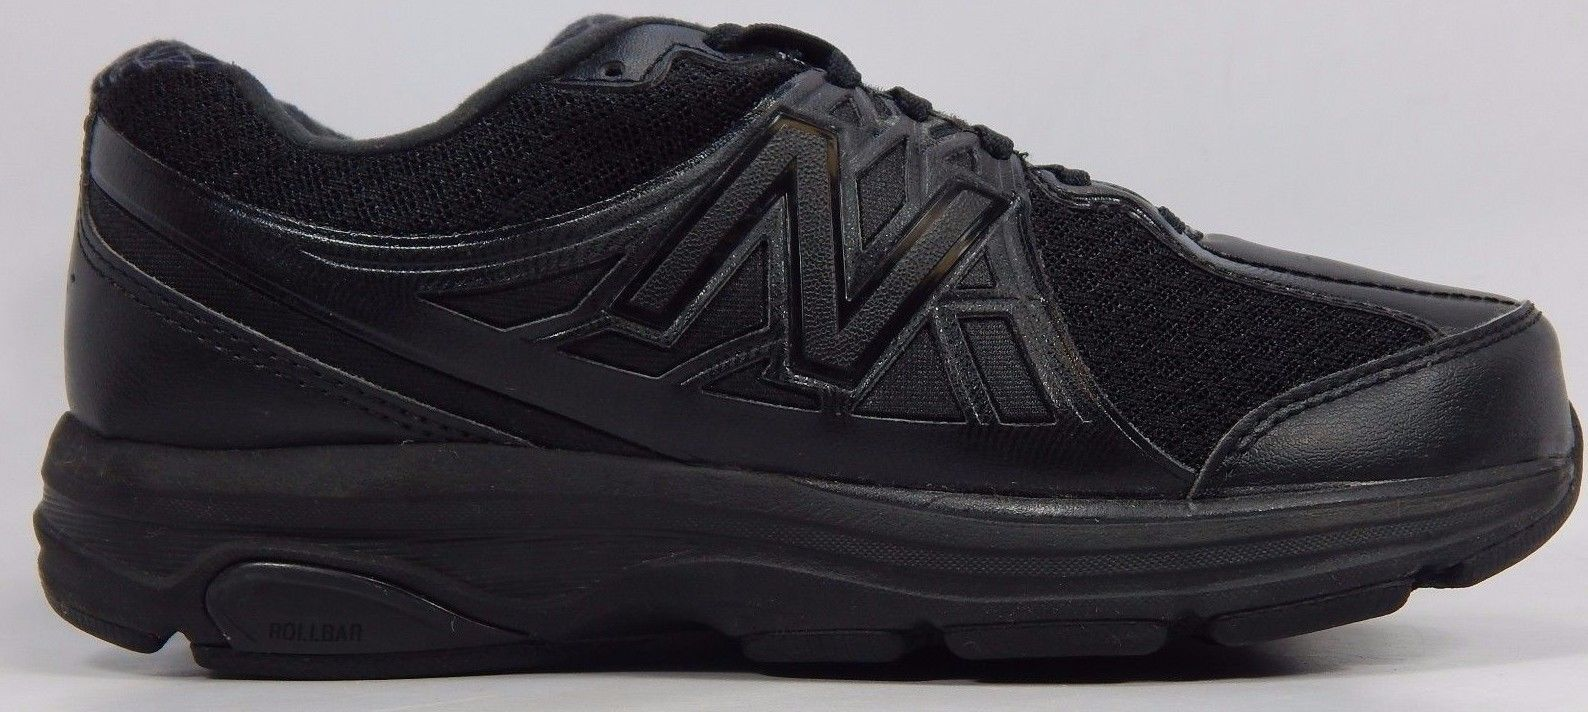 New Balance 847 v2 Women's Walking Shoes Size US 5.5 M (B) EU 36 Black WW847BK2